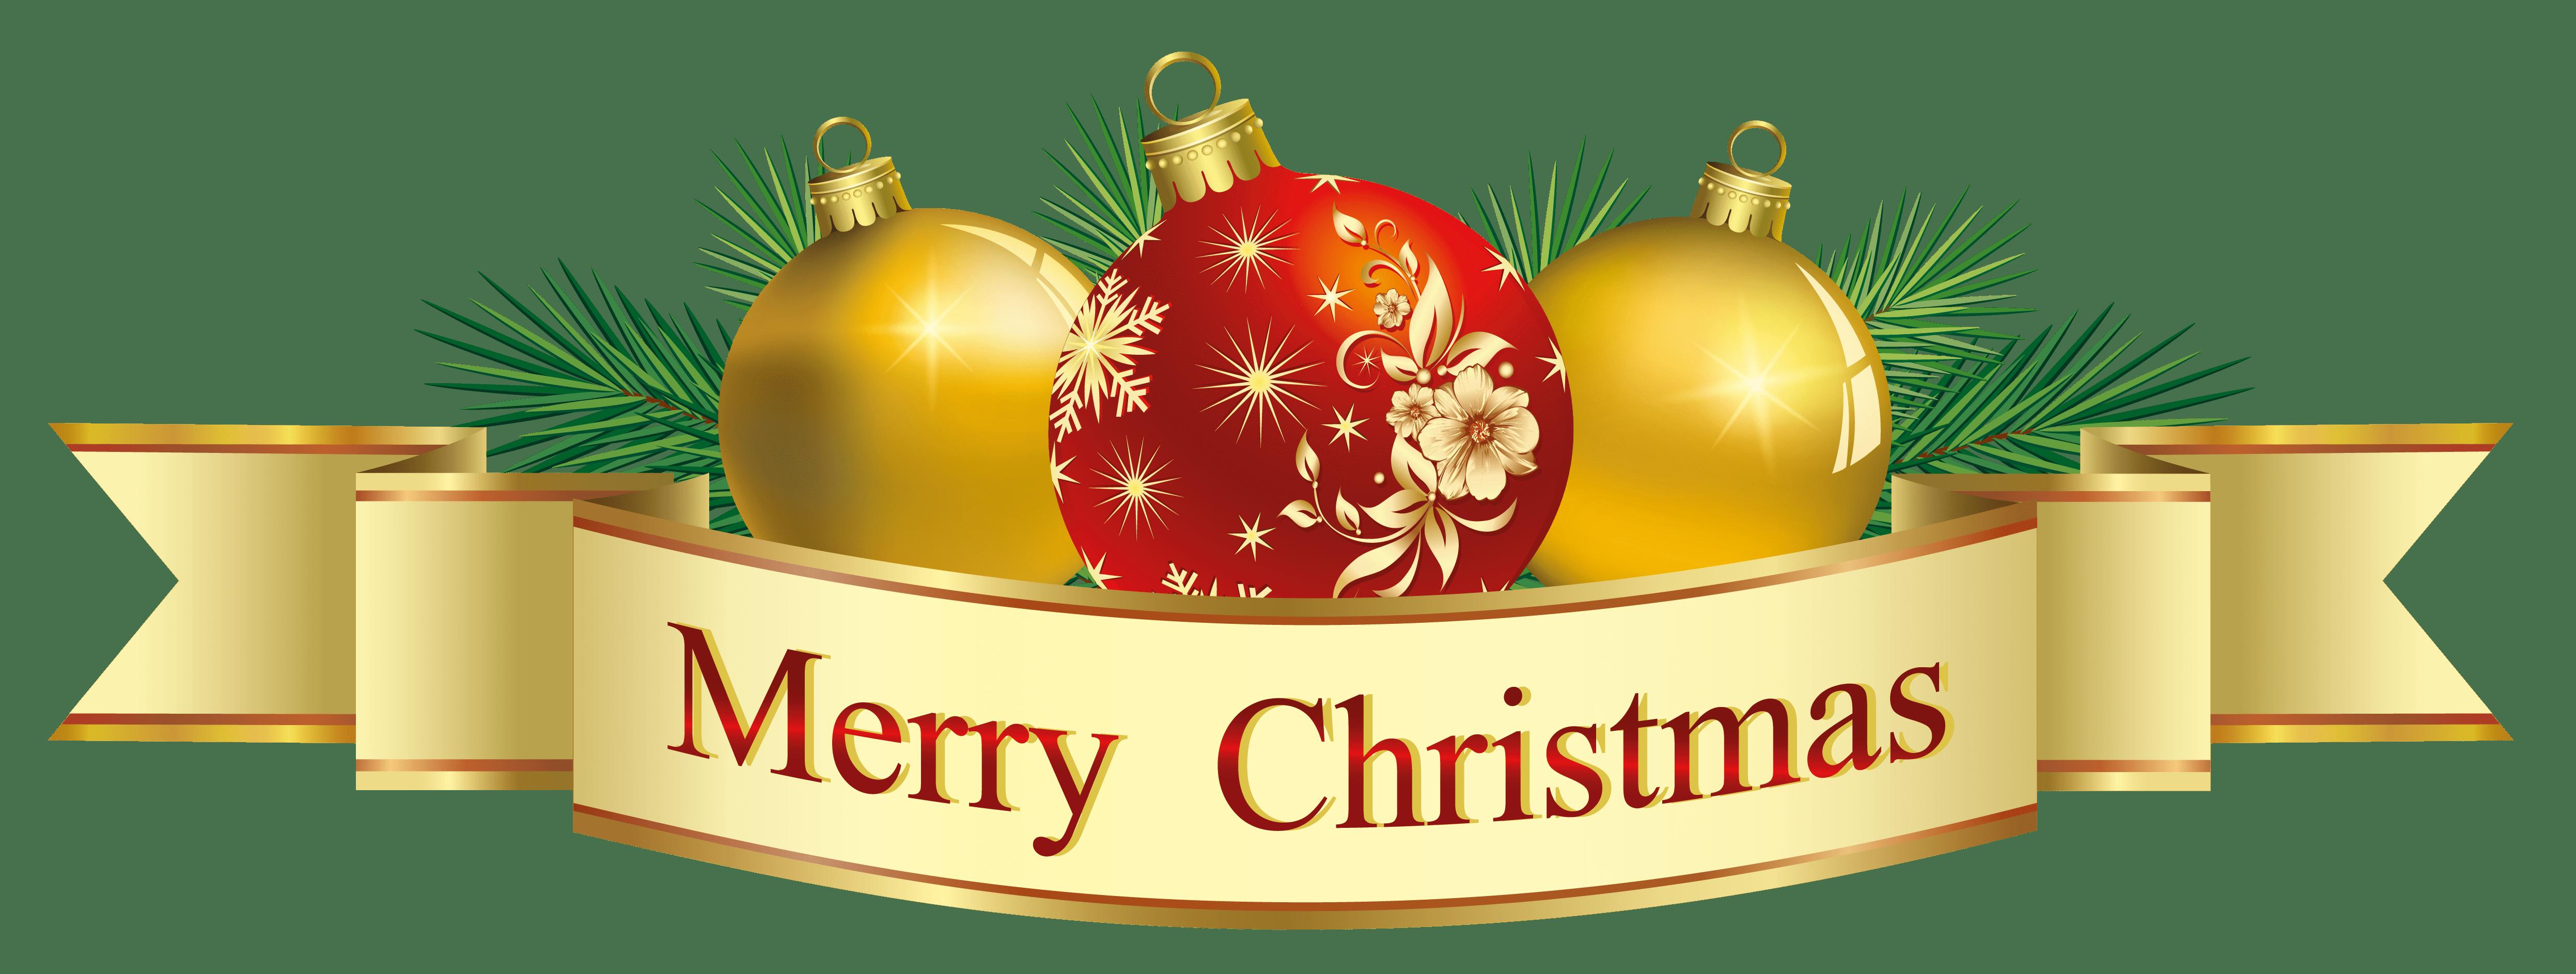 Christmas 2016 clipart clipart stock merry-christmas-clip-art-images1-klein-school-0ctsdf-clipart — SLSecrets clipart stock